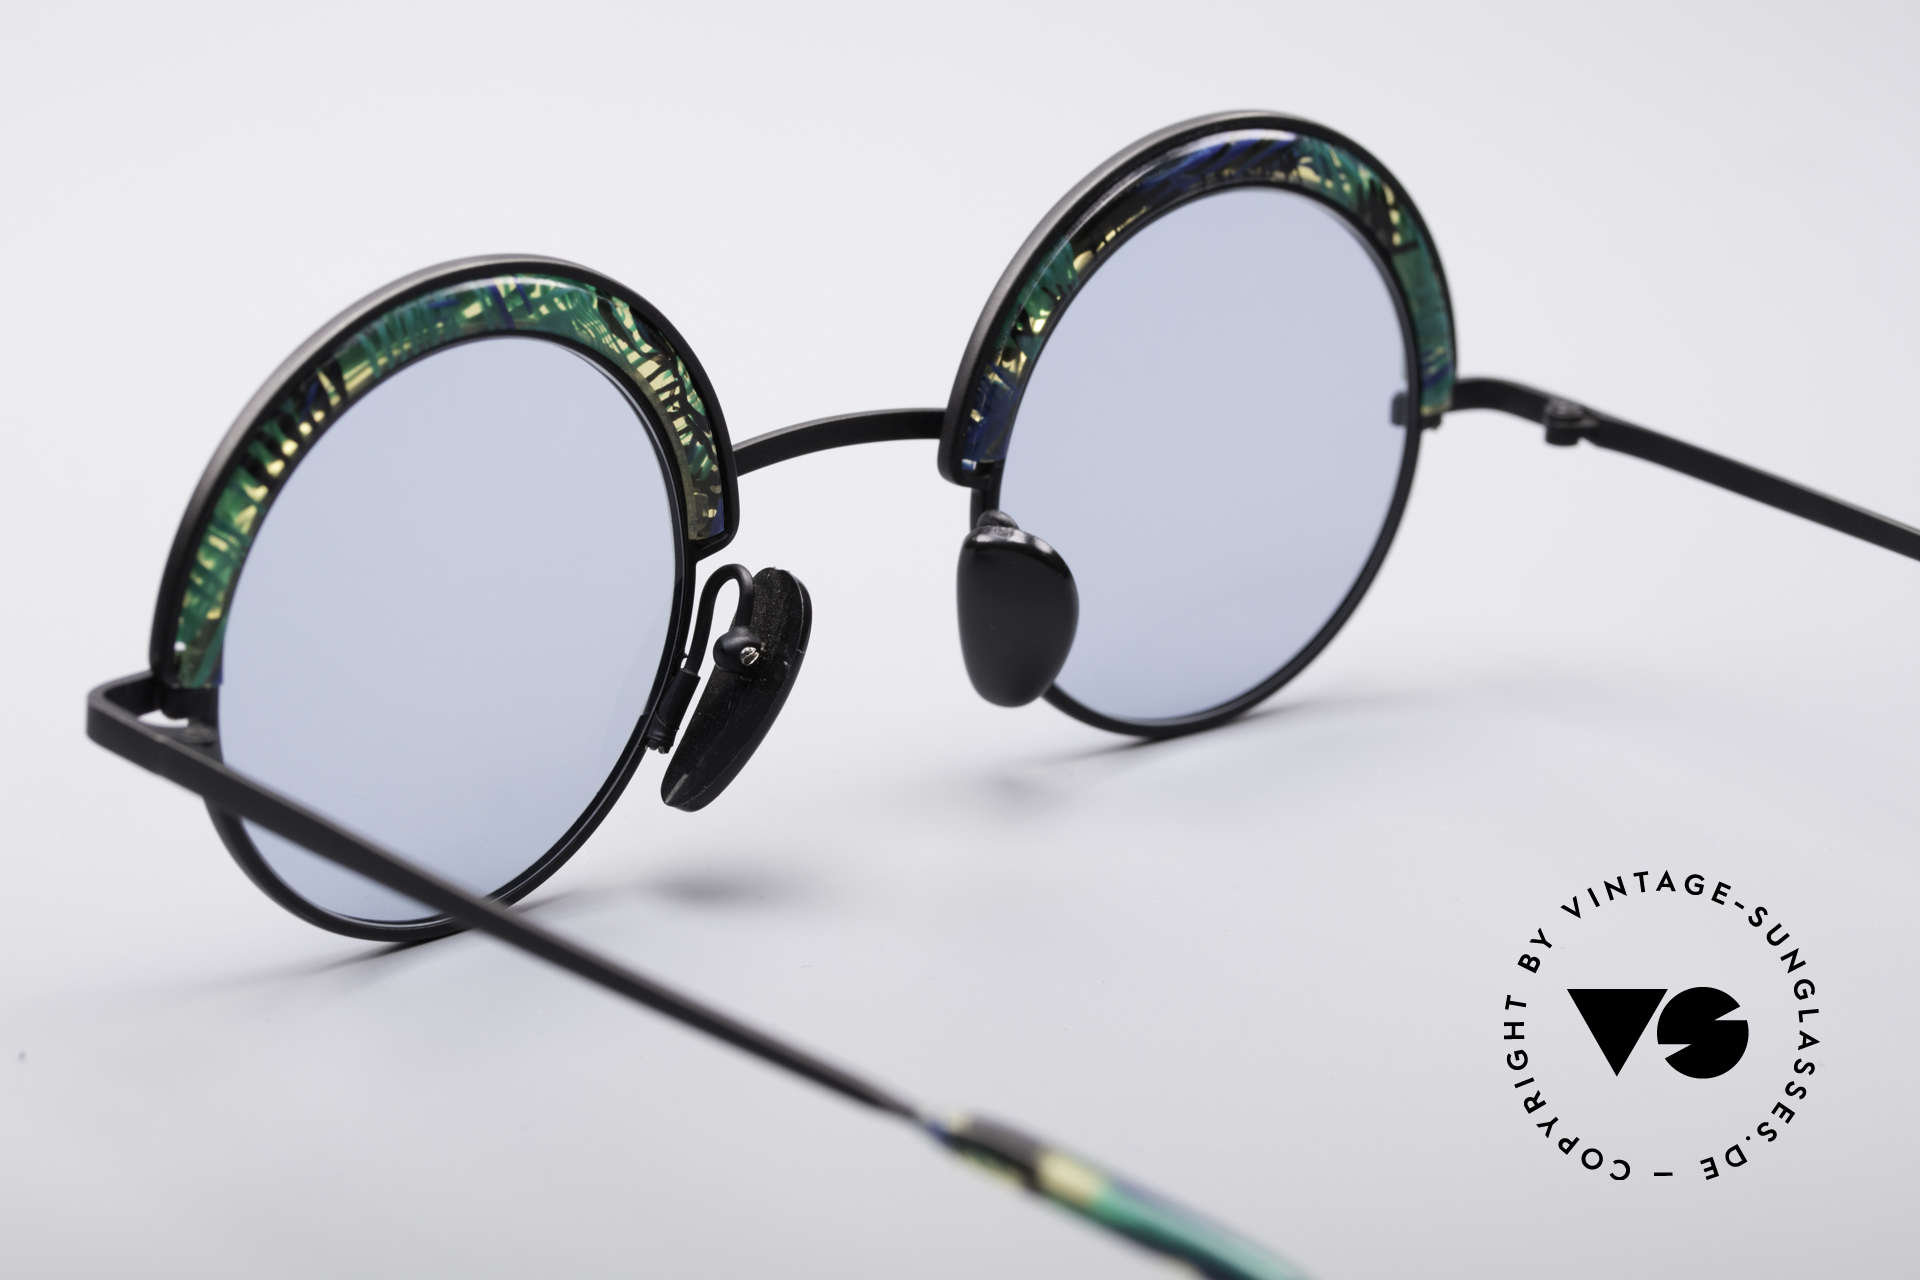 Alain Mikli 631 / 391 Round Designer Shades, NO retro fashion, but a rare 29 years old original!, Made for Men and Women